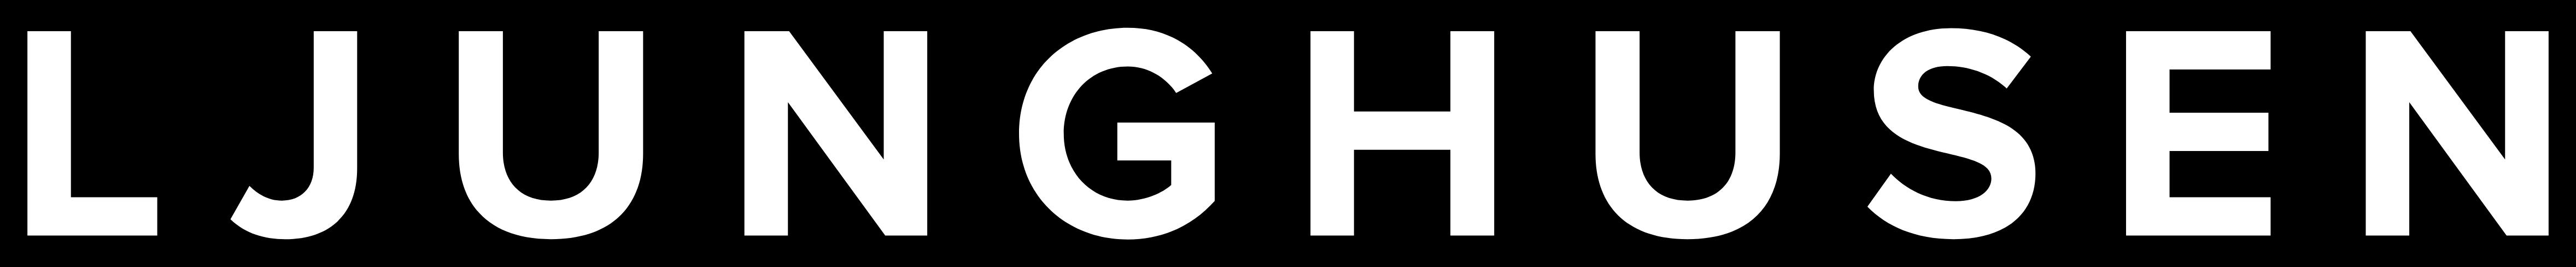 Logo Ljunghusen @ljunghusen #ljunghusen